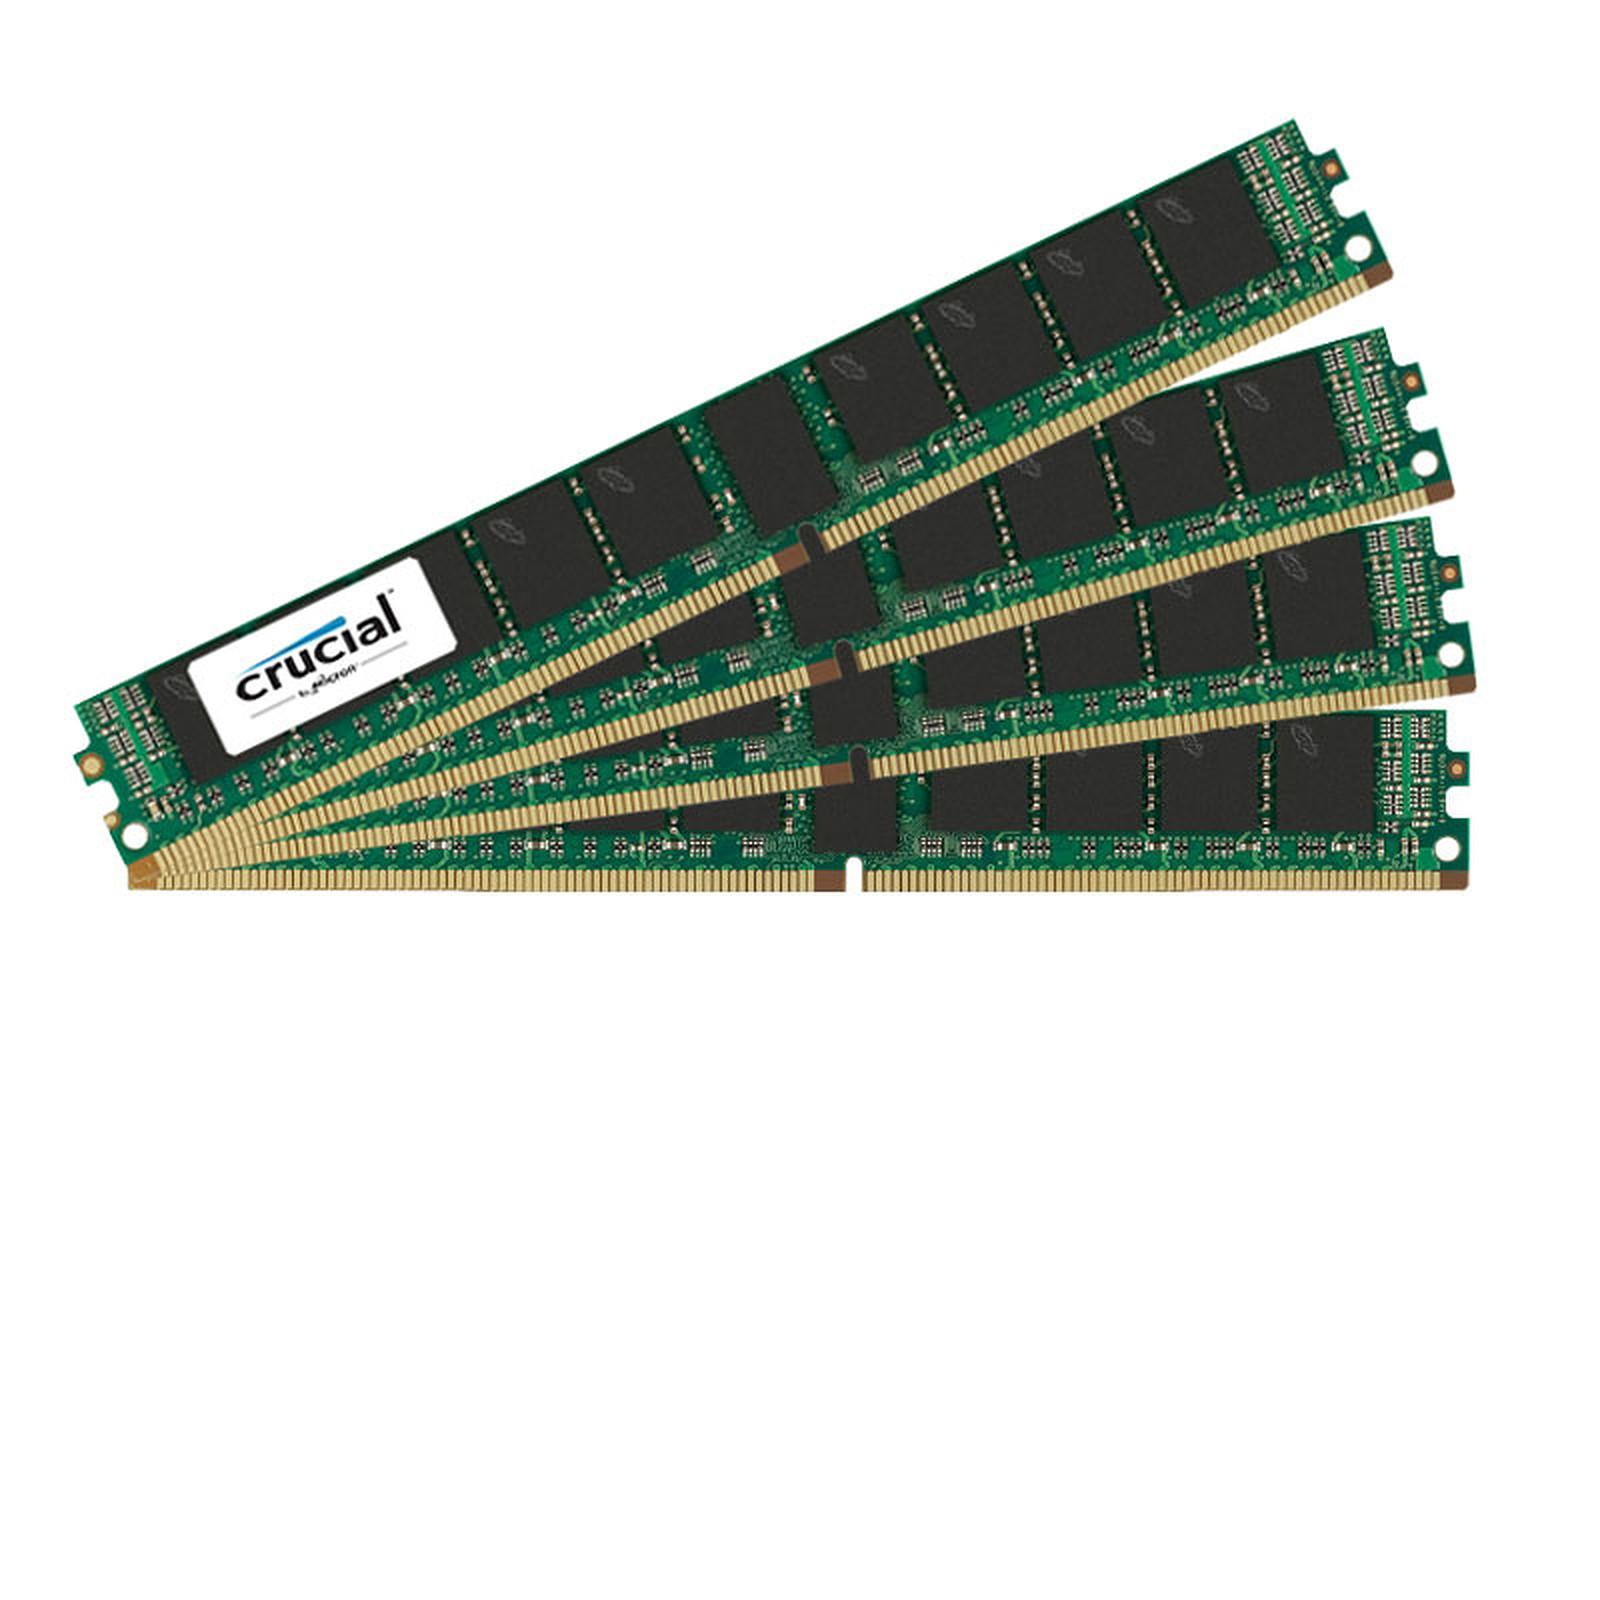 Crucial DDR4 64 Go (4 x 16 Go) 2400 MHz CL17 ECC Registered SR X4 VLP